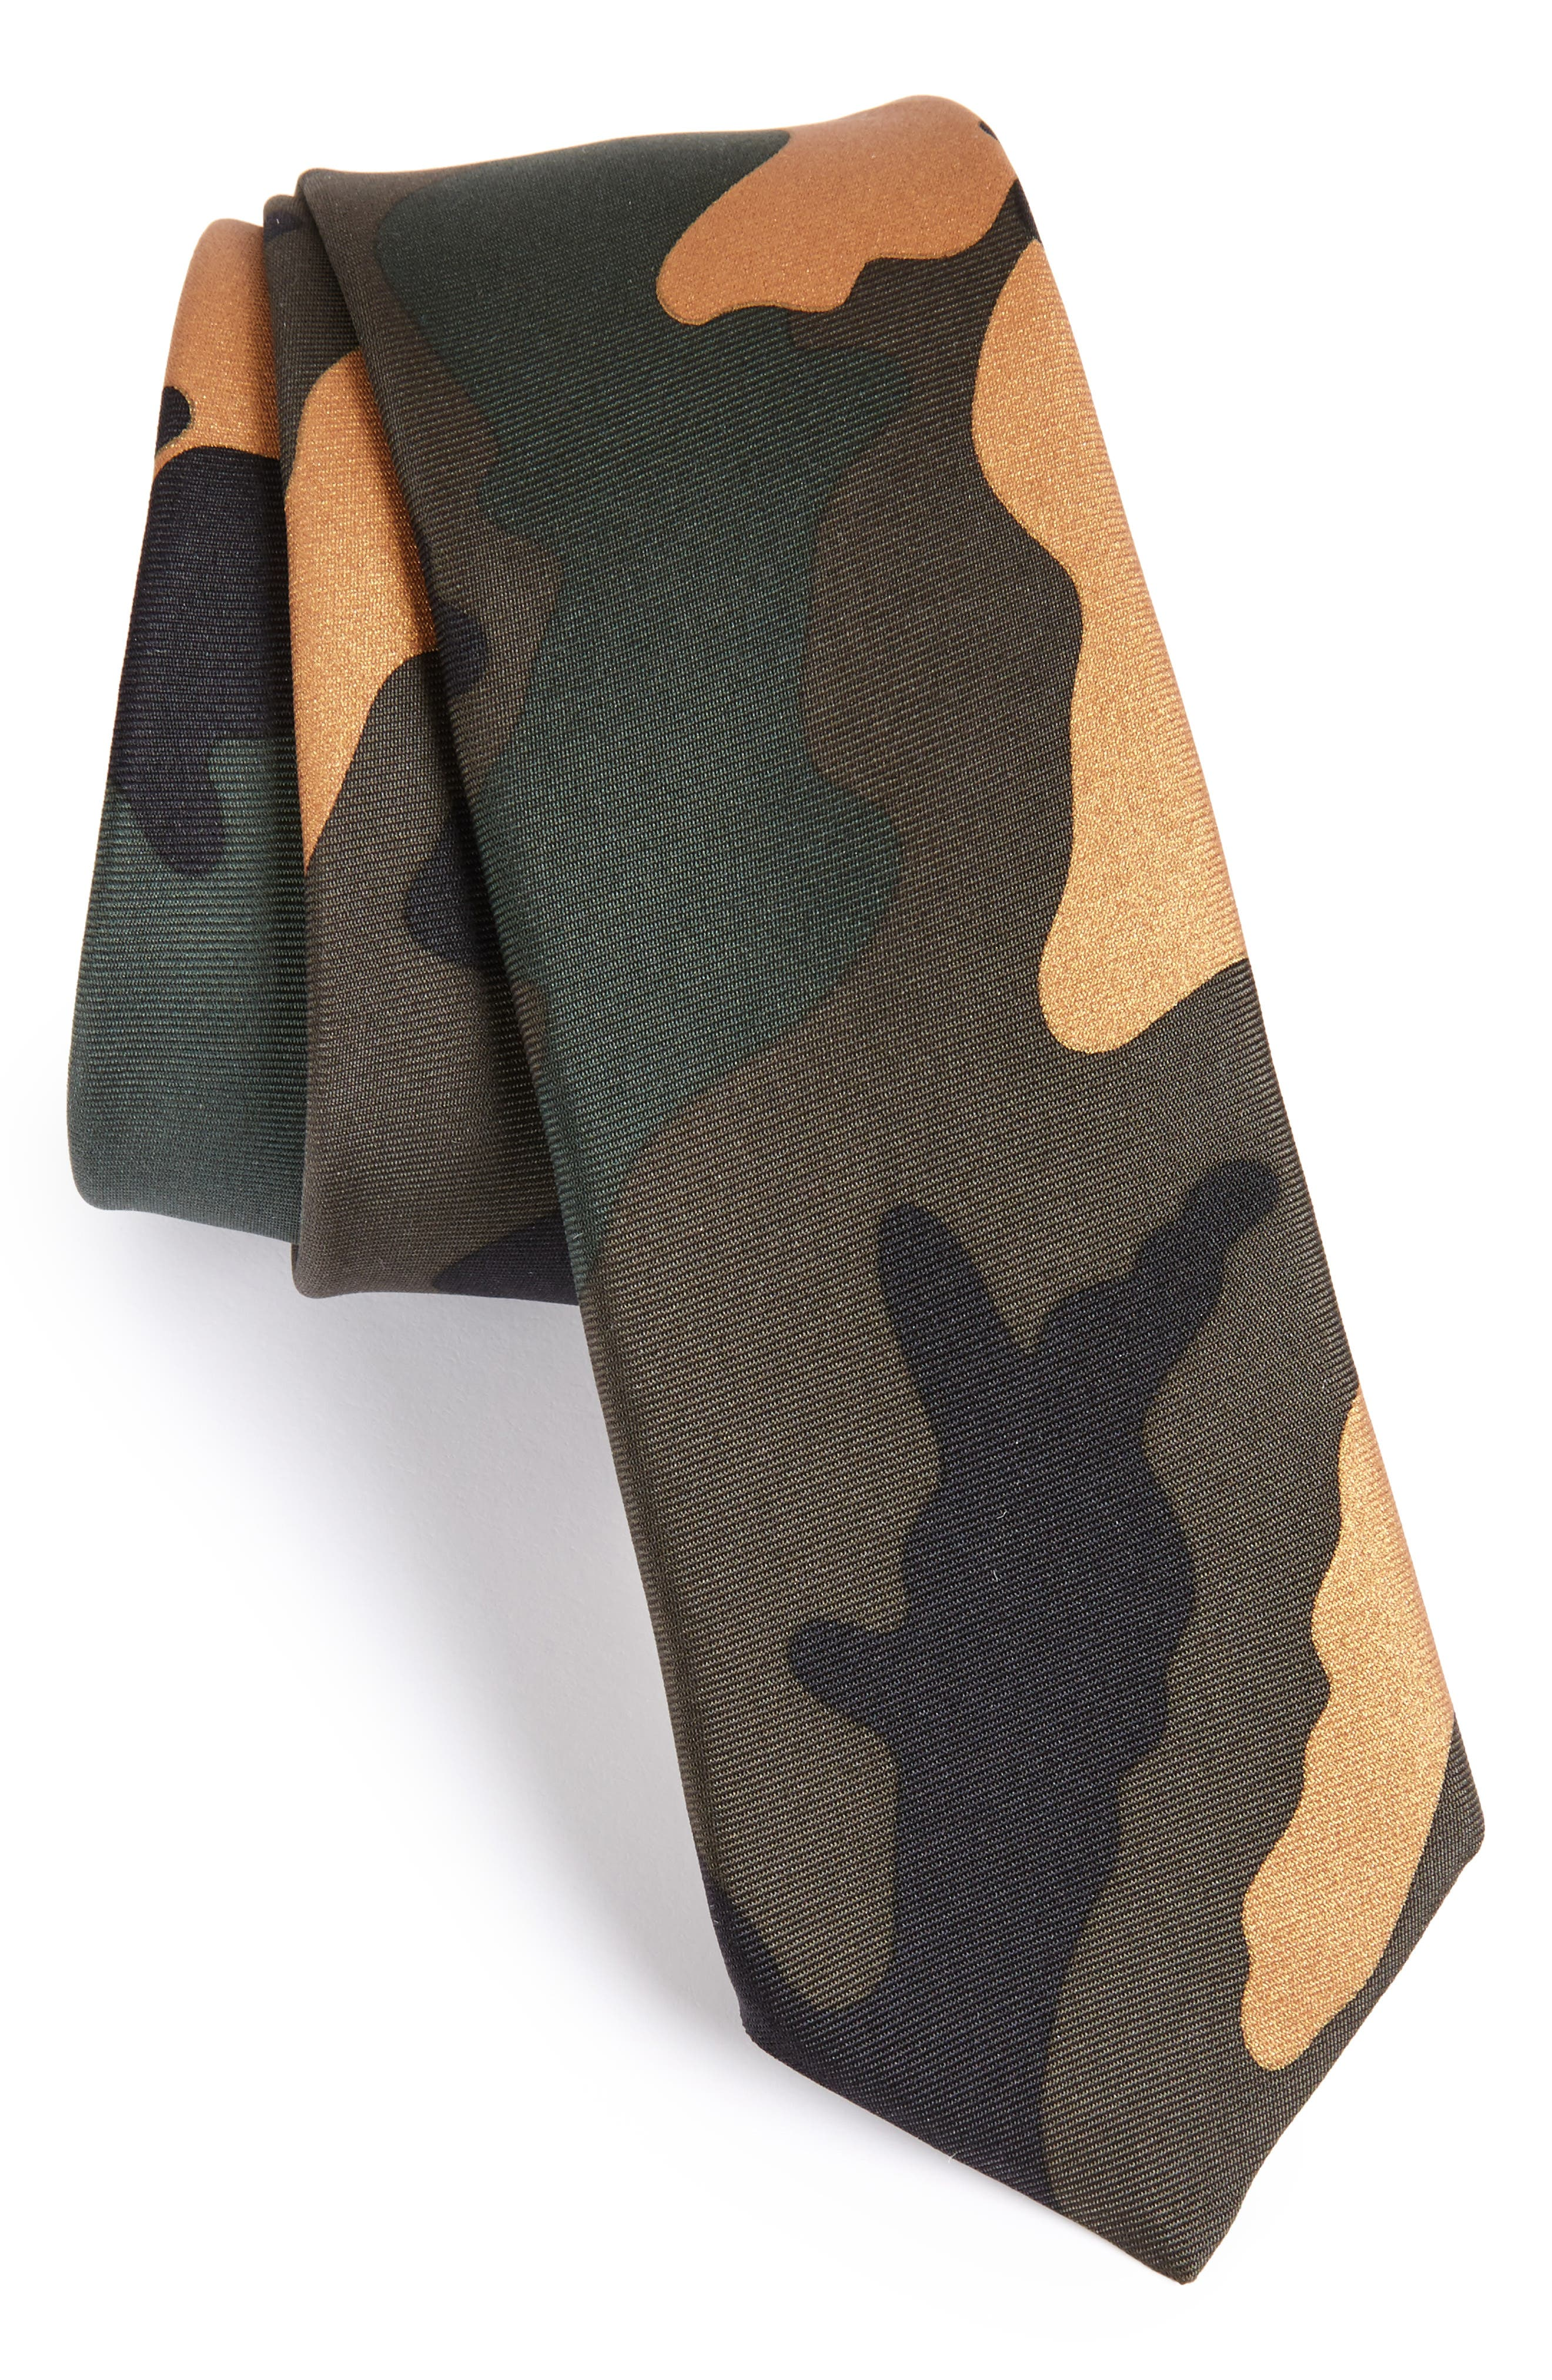 Camo Silk Skinny Tie,                             Main thumbnail 1, color,                             Army Camo